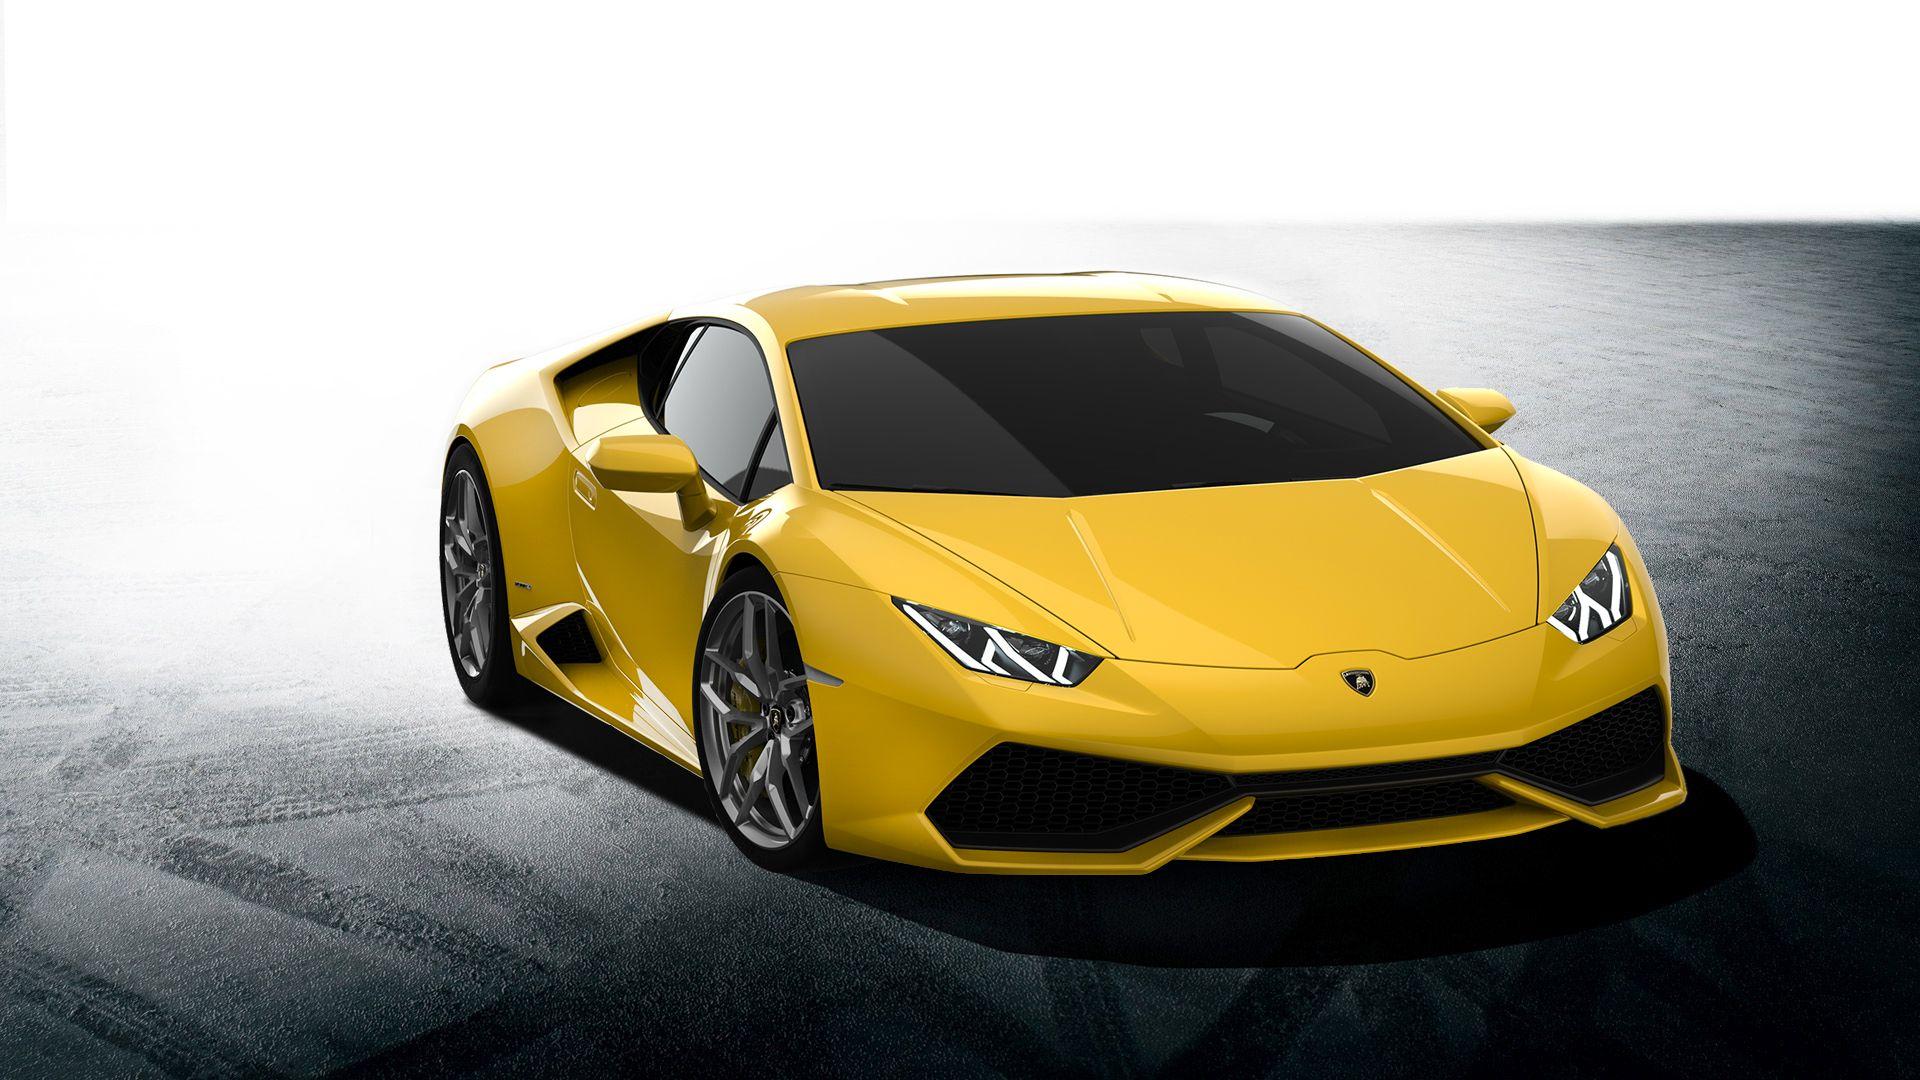 The Lamborghini Huracán is a sports car built by Lamborghini that ...